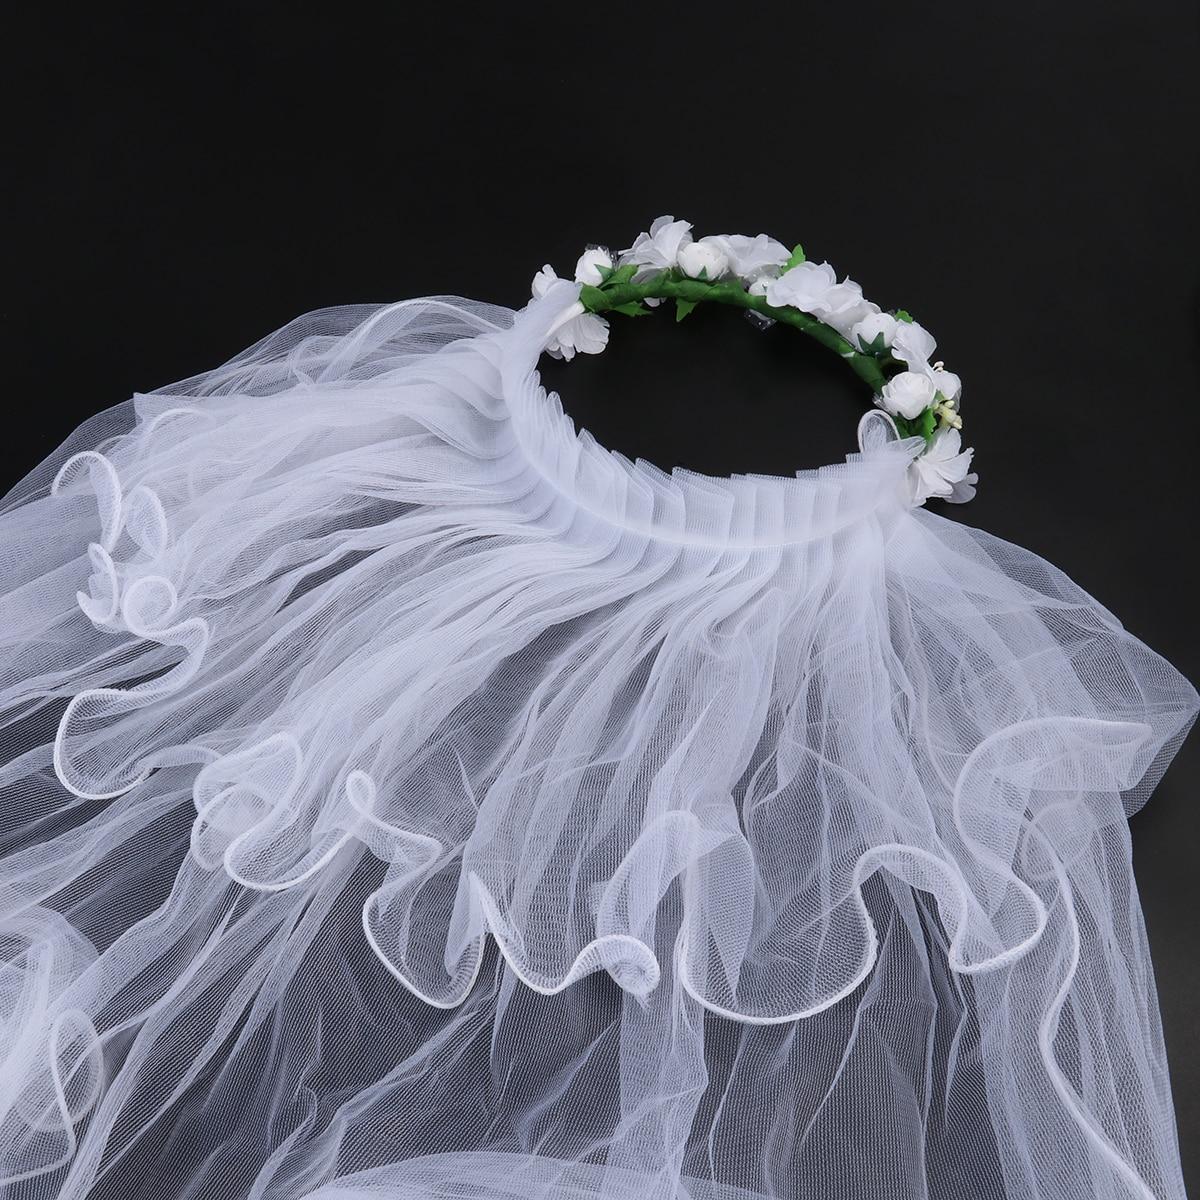 Two Layers Wedding Bridal Veil Flower Girl White Wedding Veils Communion Hair Wreath For Wedding Accessories (White)